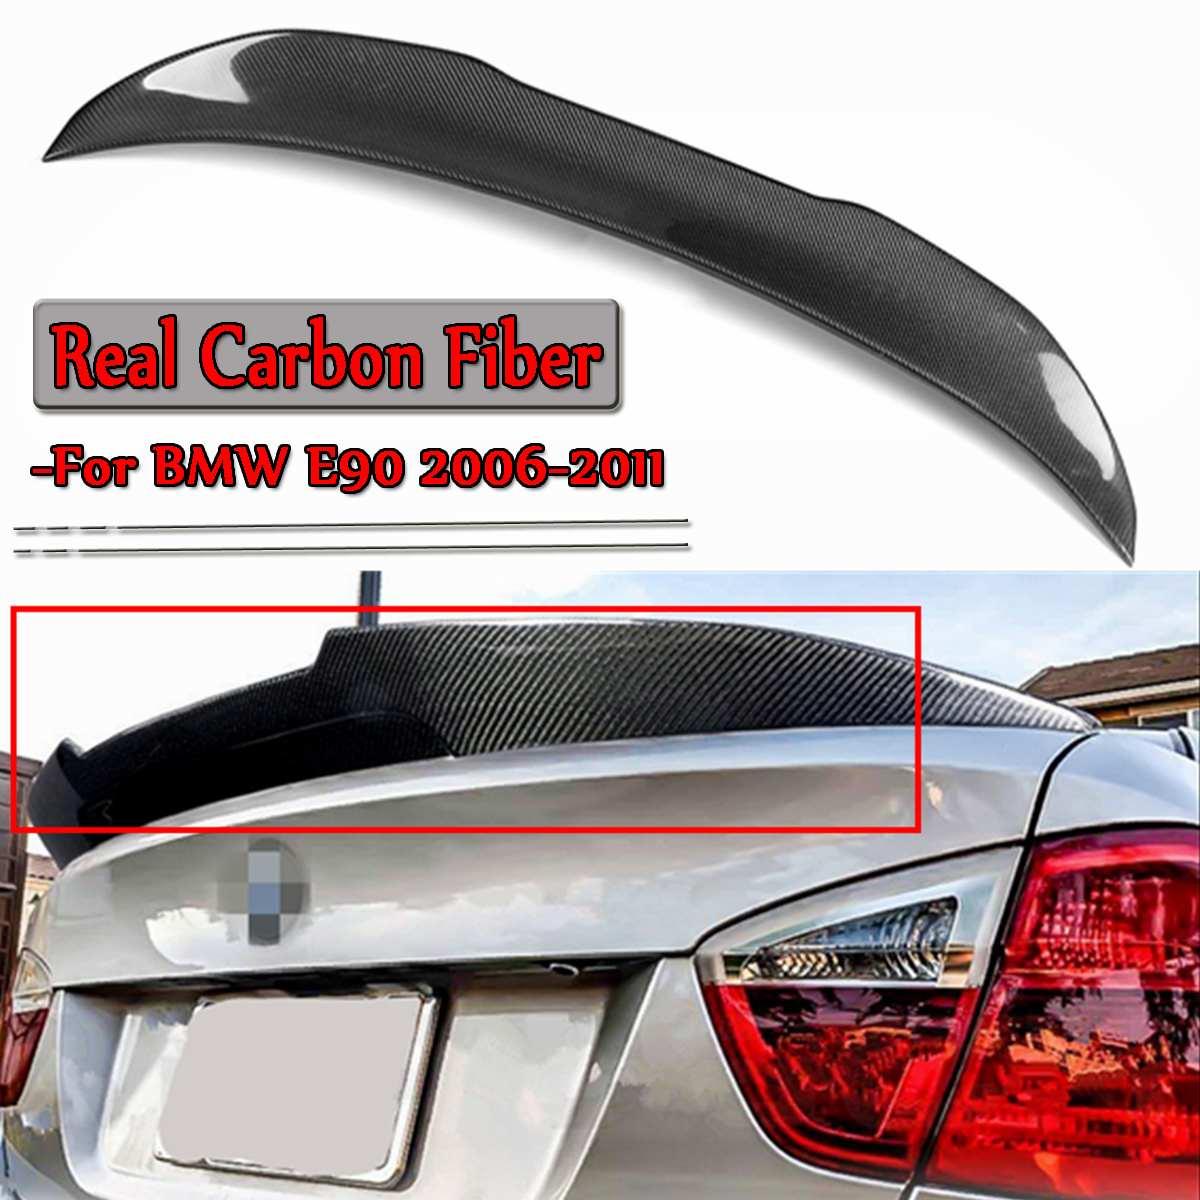 New E90 Real Carbon Fiber Car Rear Trunk Spoiler Wing For BMW E90 3 Series M3 4 Door Sedan 2006-2011 Racing Spoiler WingNew E90 Real Carbon Fiber Car Rear Trunk Spoiler Wing For BMW E90 3 Series M3 4 Door Sedan 2006-2011 Racing Spoiler Wing